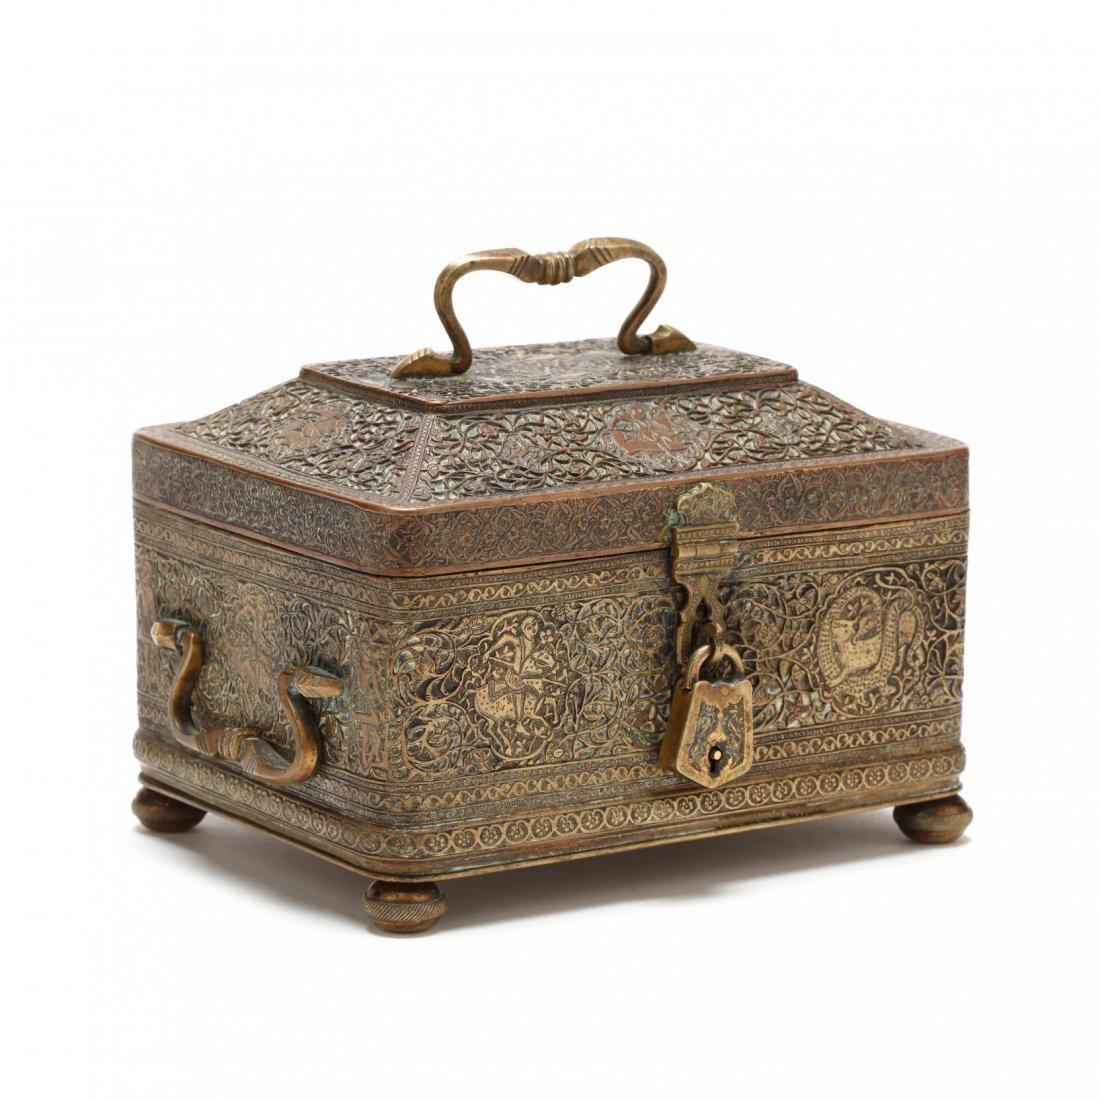 Persian Qajar Copper Jewelry Box c.19th cent AD.